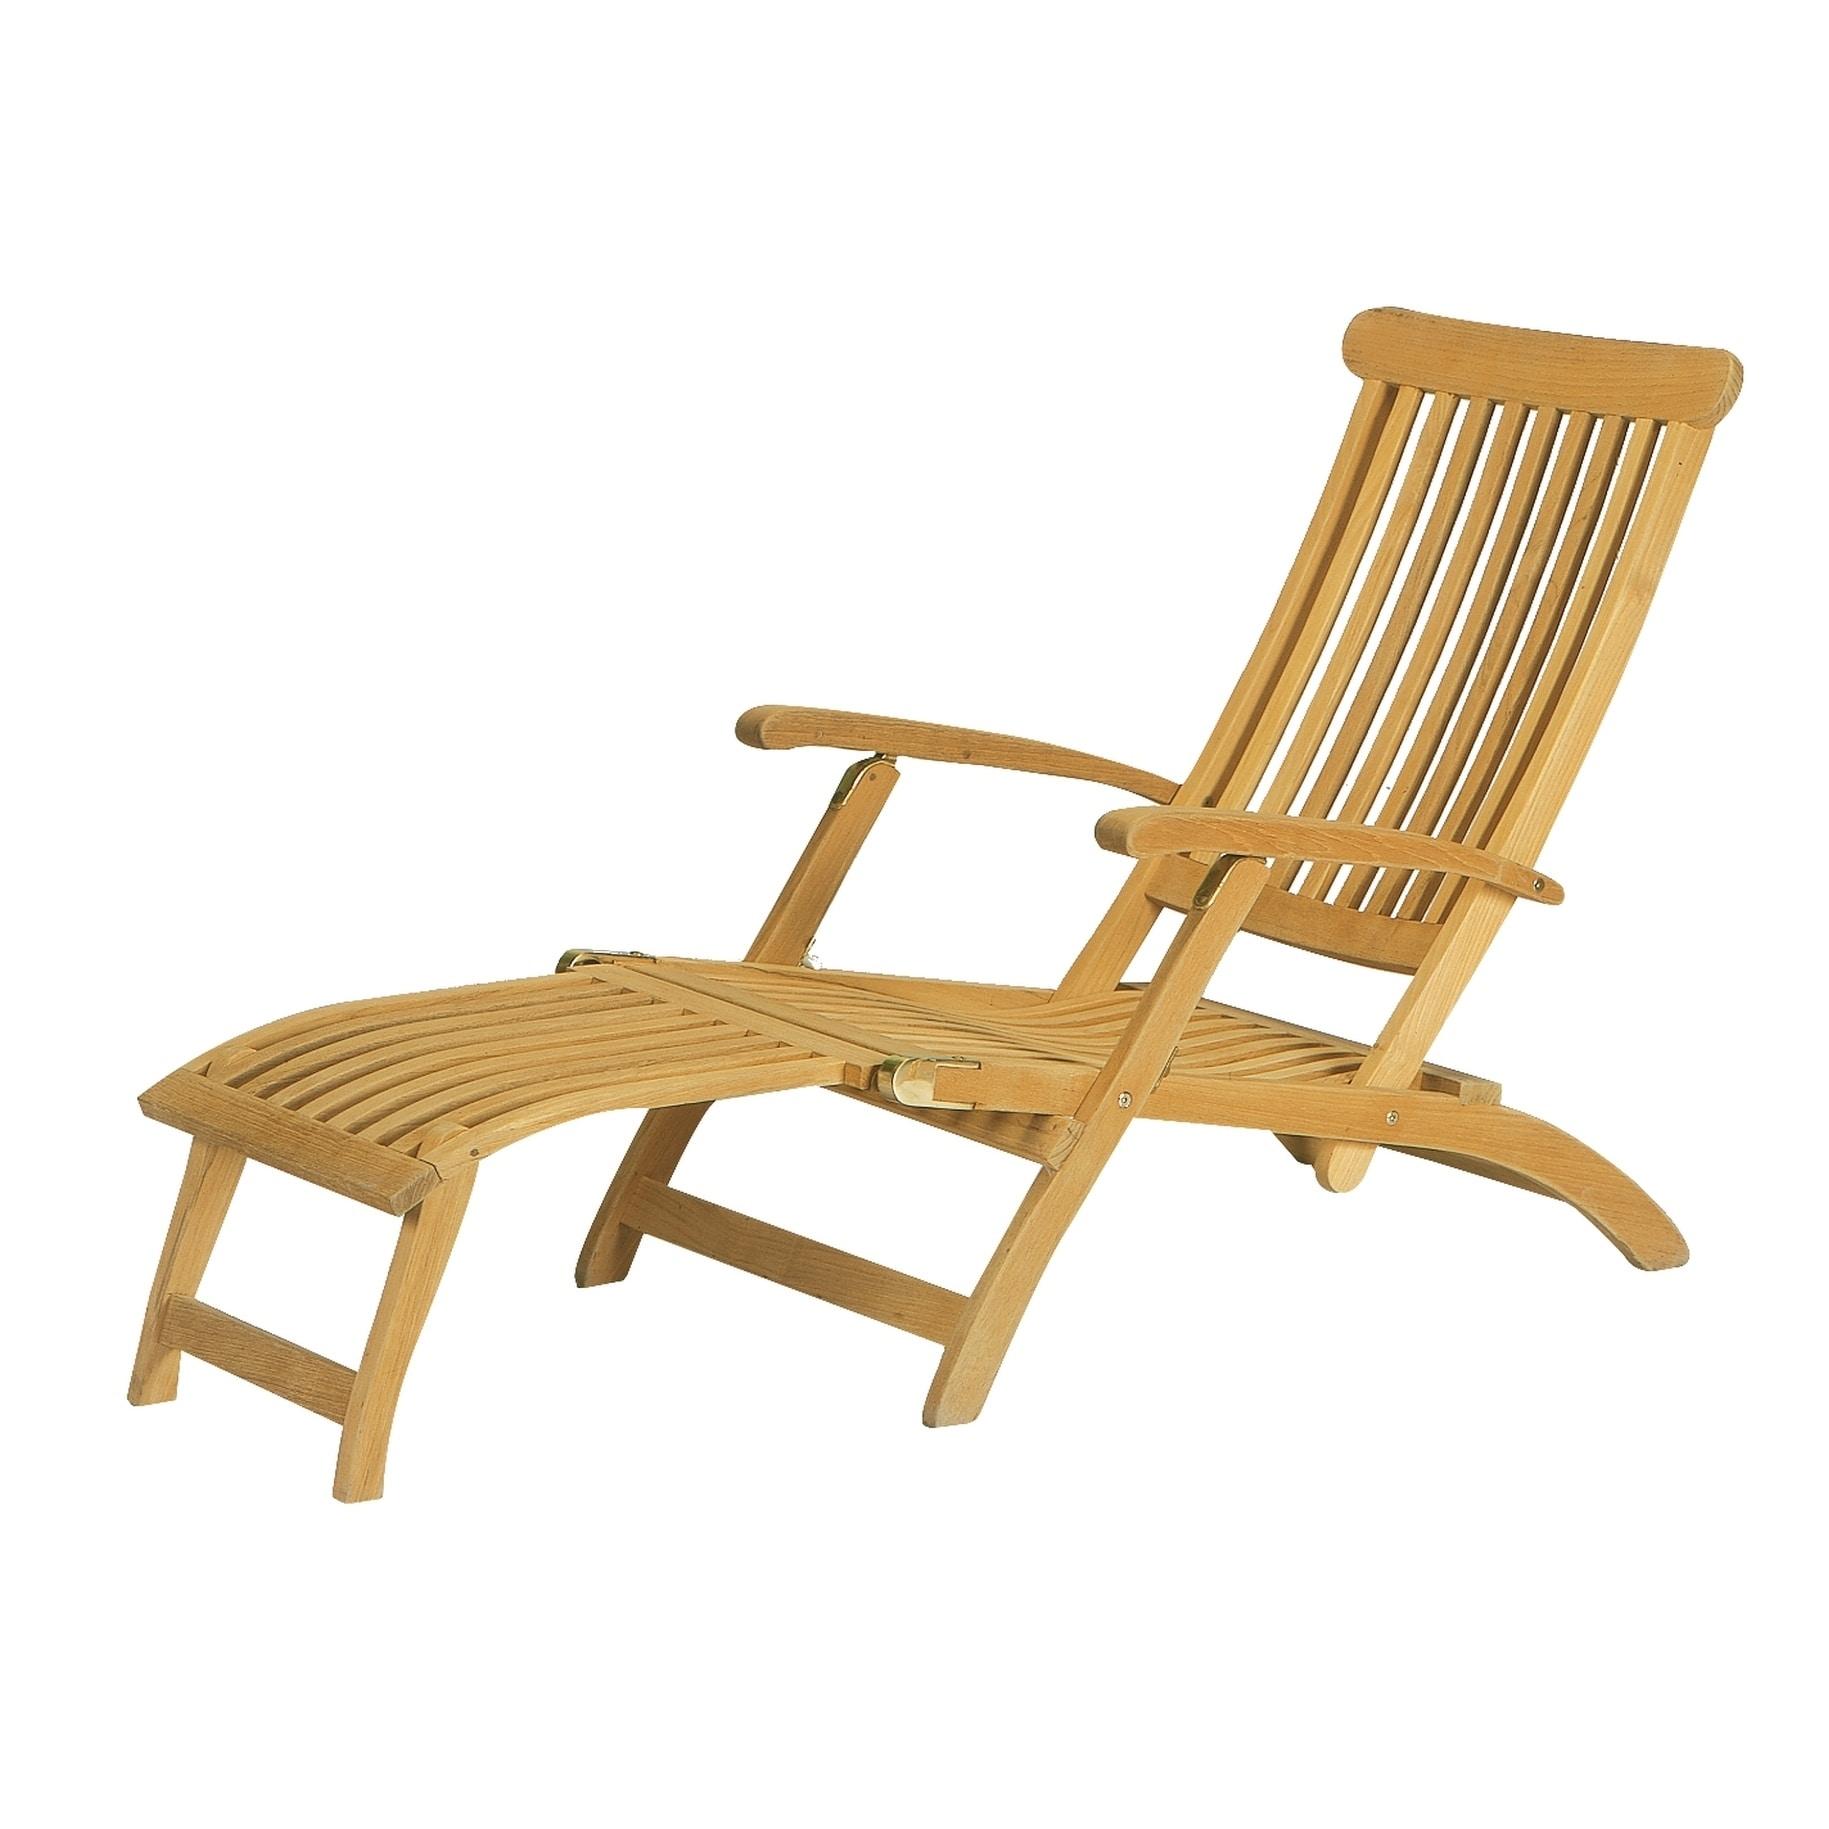 HiTeak Steamer Outdoor Folding Teak Chaise Lounge Chair, ...